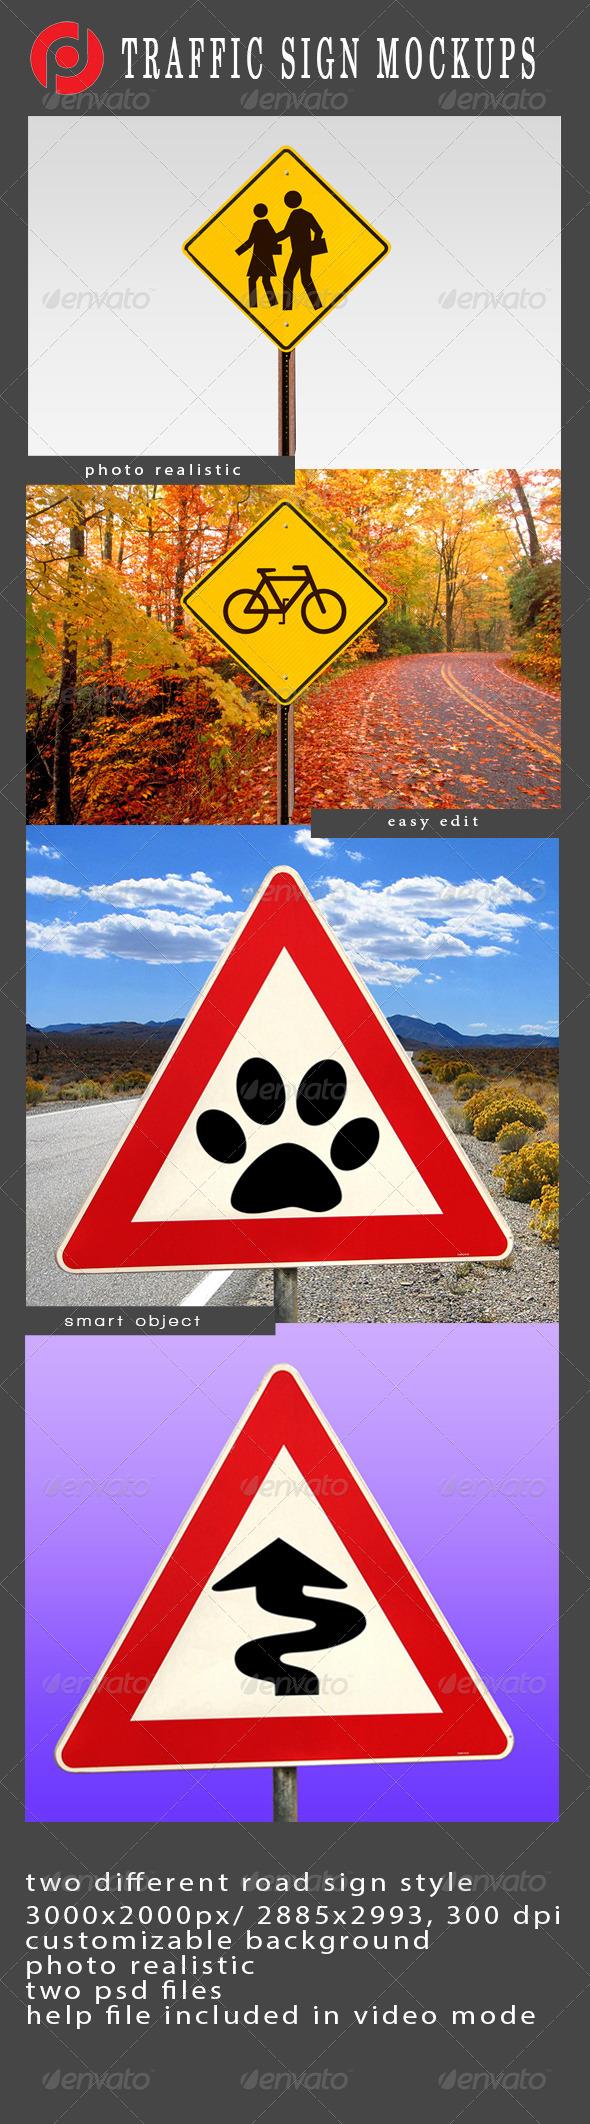 GraphicRiver Traffic Sign Mockup 4869508